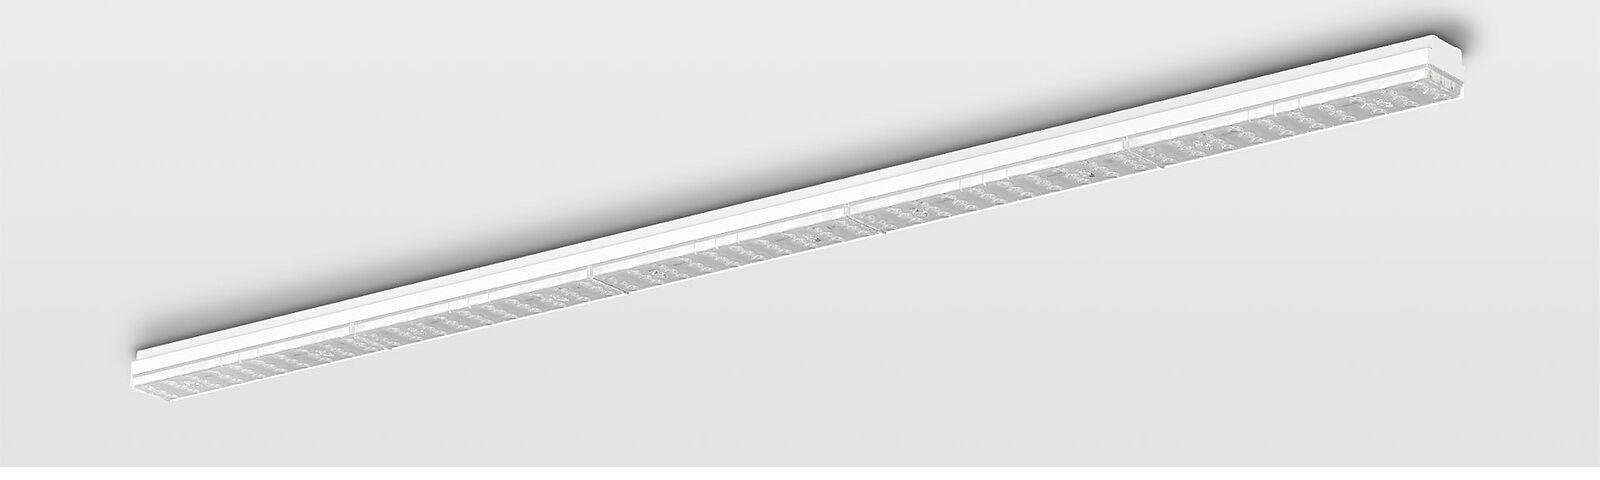 5183270AA 5183271AA Passend f/ür Ram 1500 2500 3500 4500 5500 Akozon Overhead Console Leselampe Lampe linke und rechte Linse OE